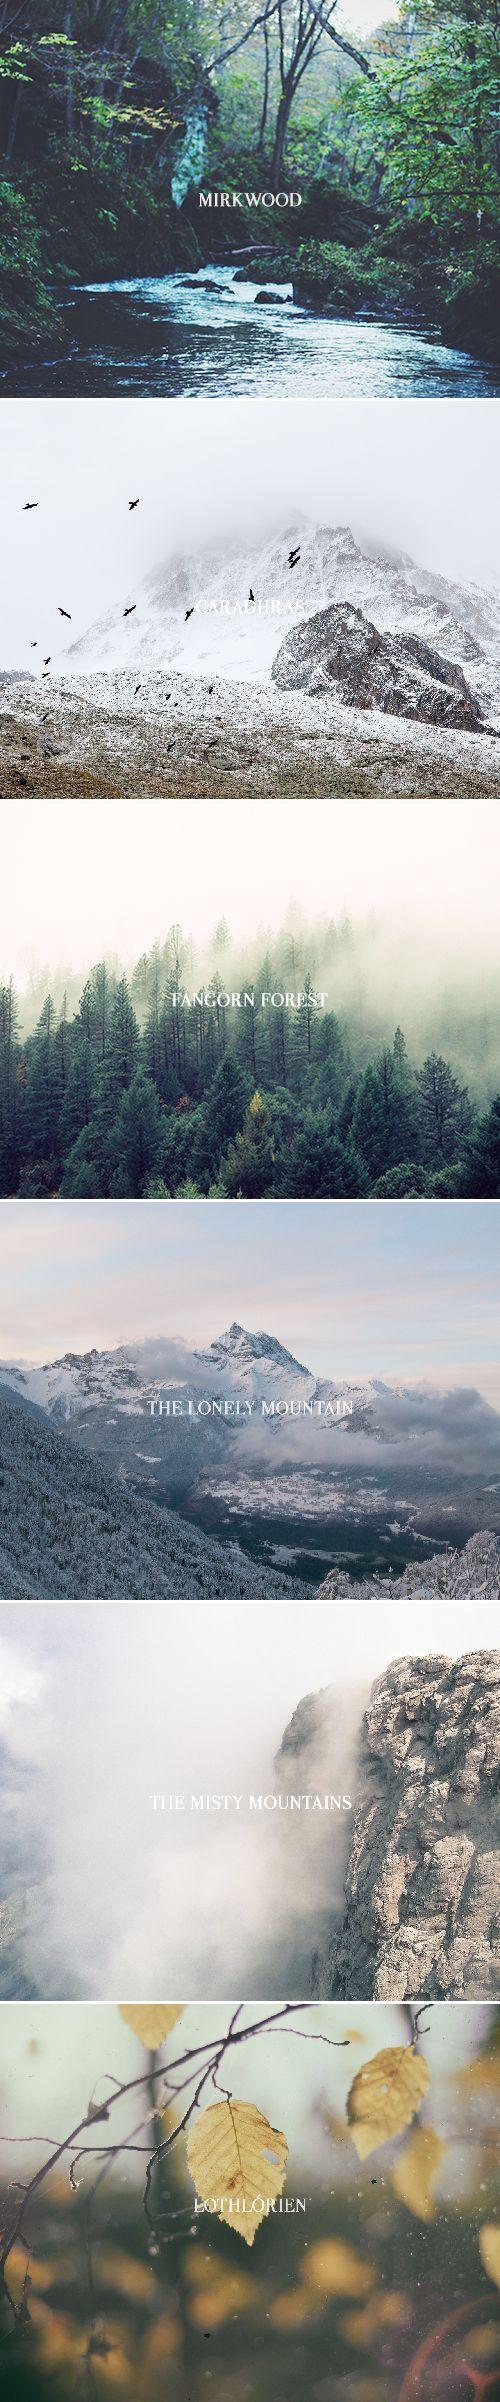 Middle-earth + aesthetics pt. I